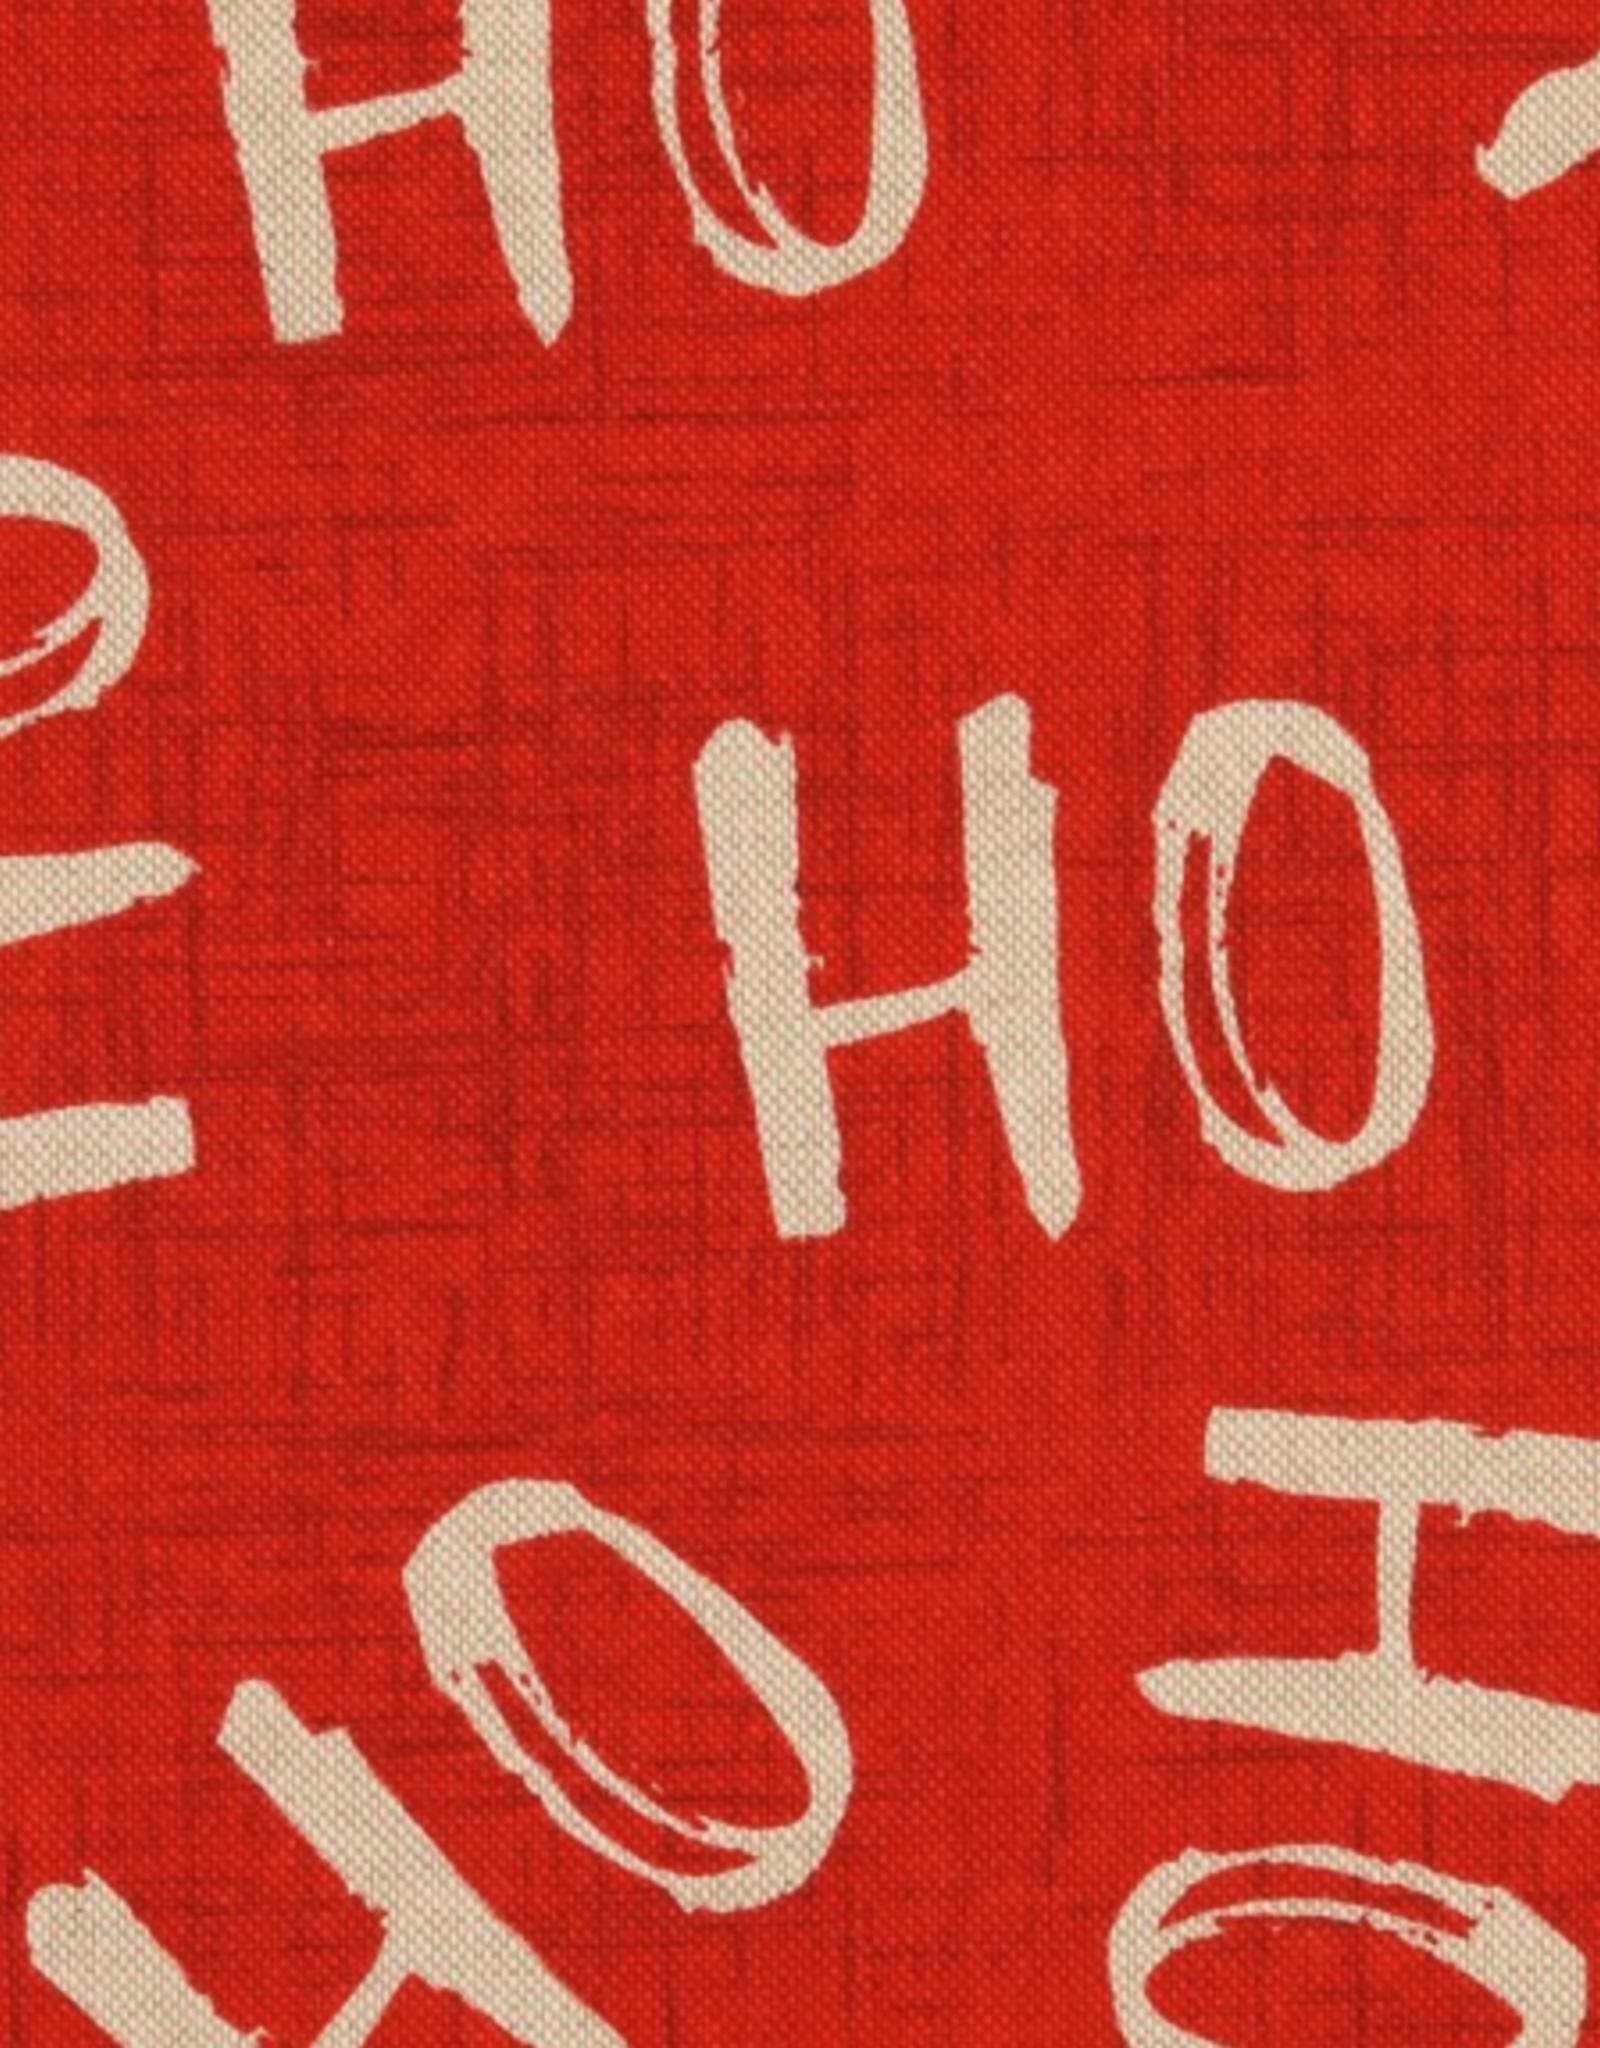 Canvas - HO HO HO red